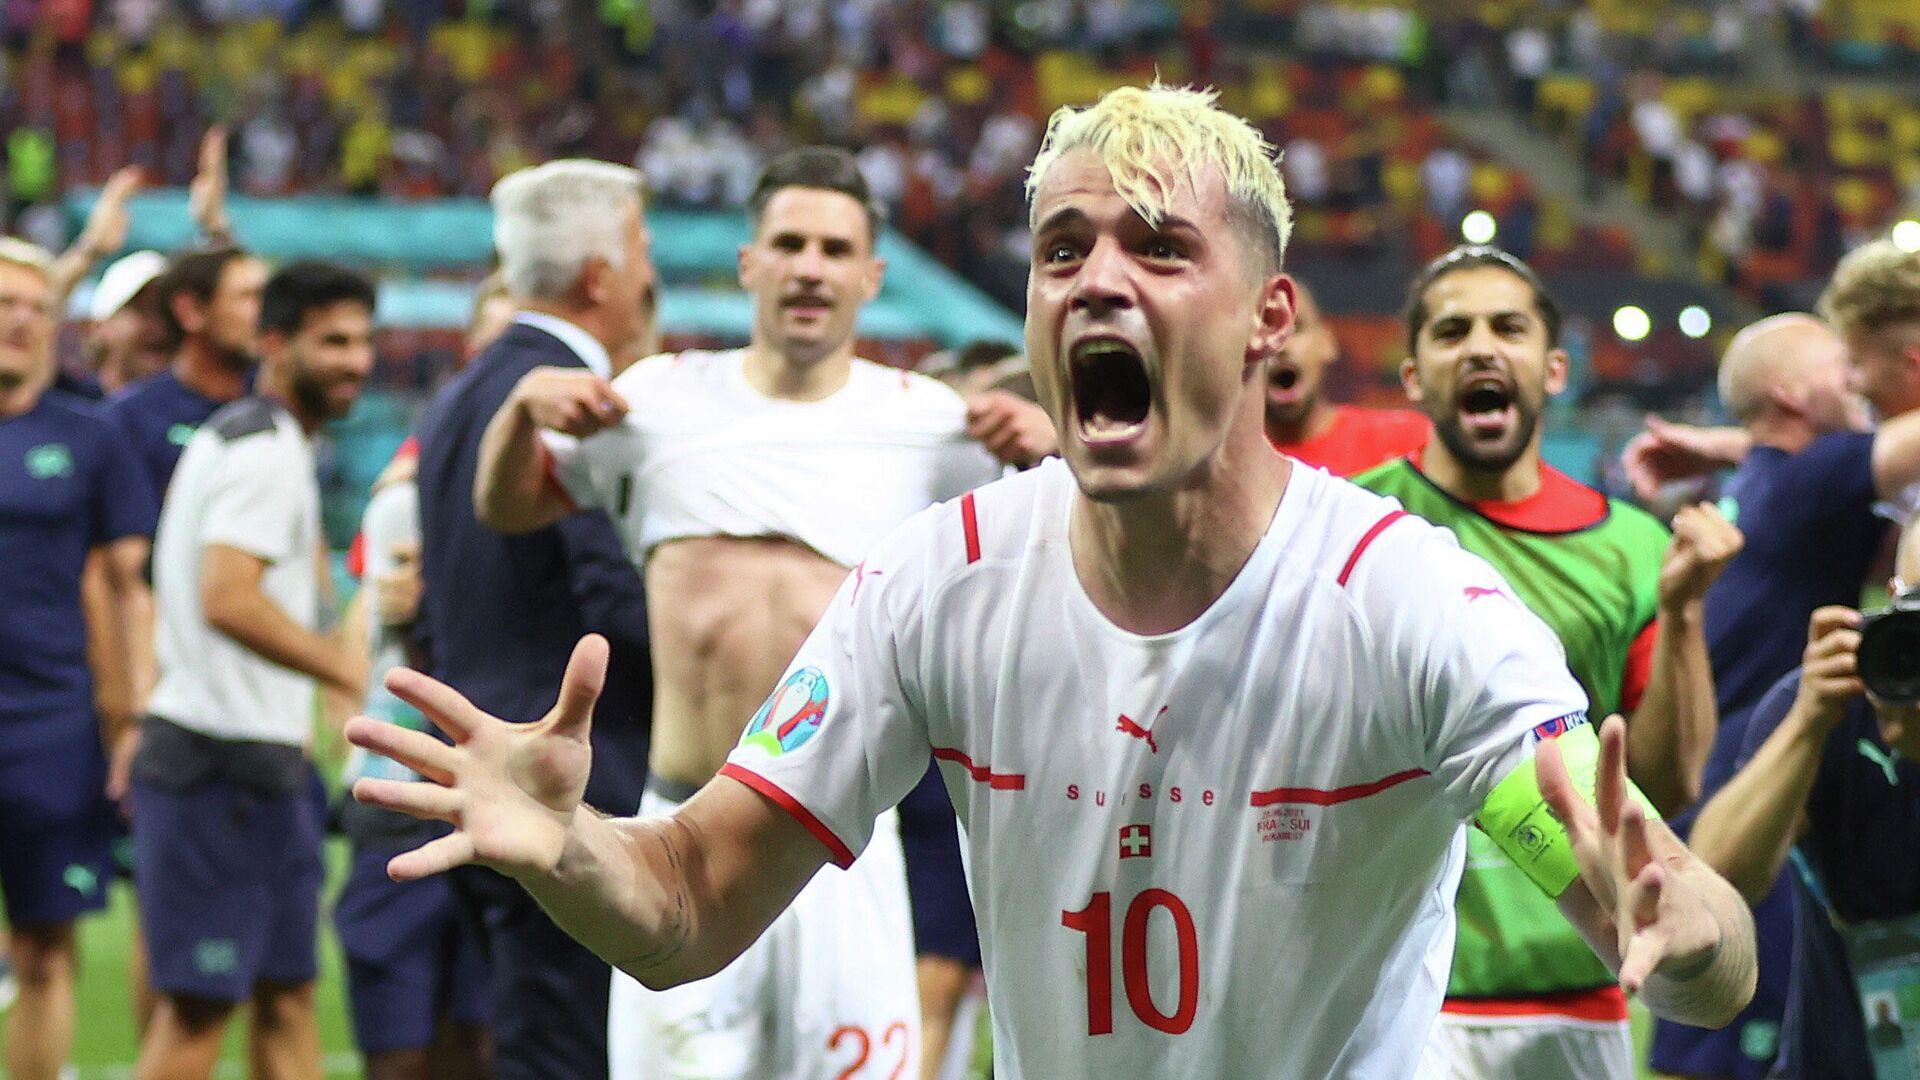 Granit Xhaka, futbolista suizo, celebra la victoria de su equipo sobre Francia en la Eurocopa - Sputnik Mundo, 1920, 29.06.2021